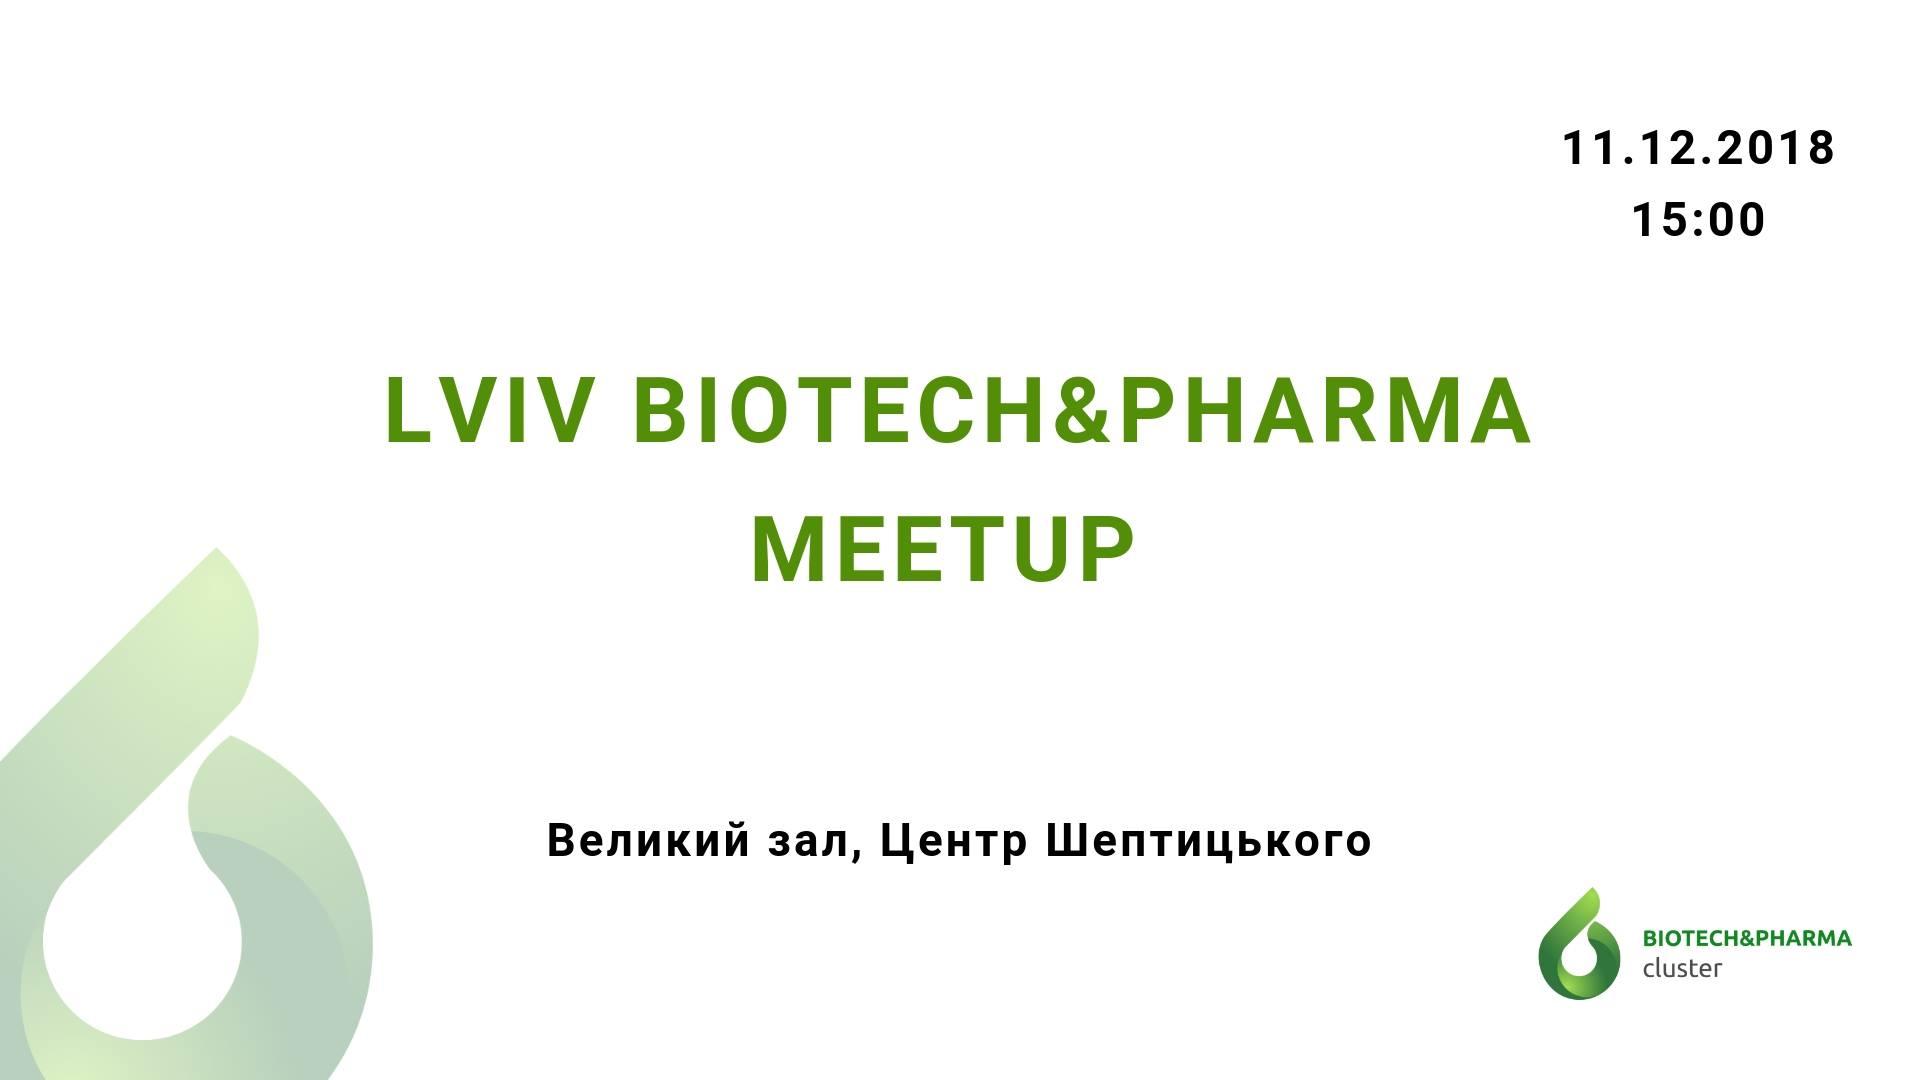 Lviv Biotech&Pharma Meetup